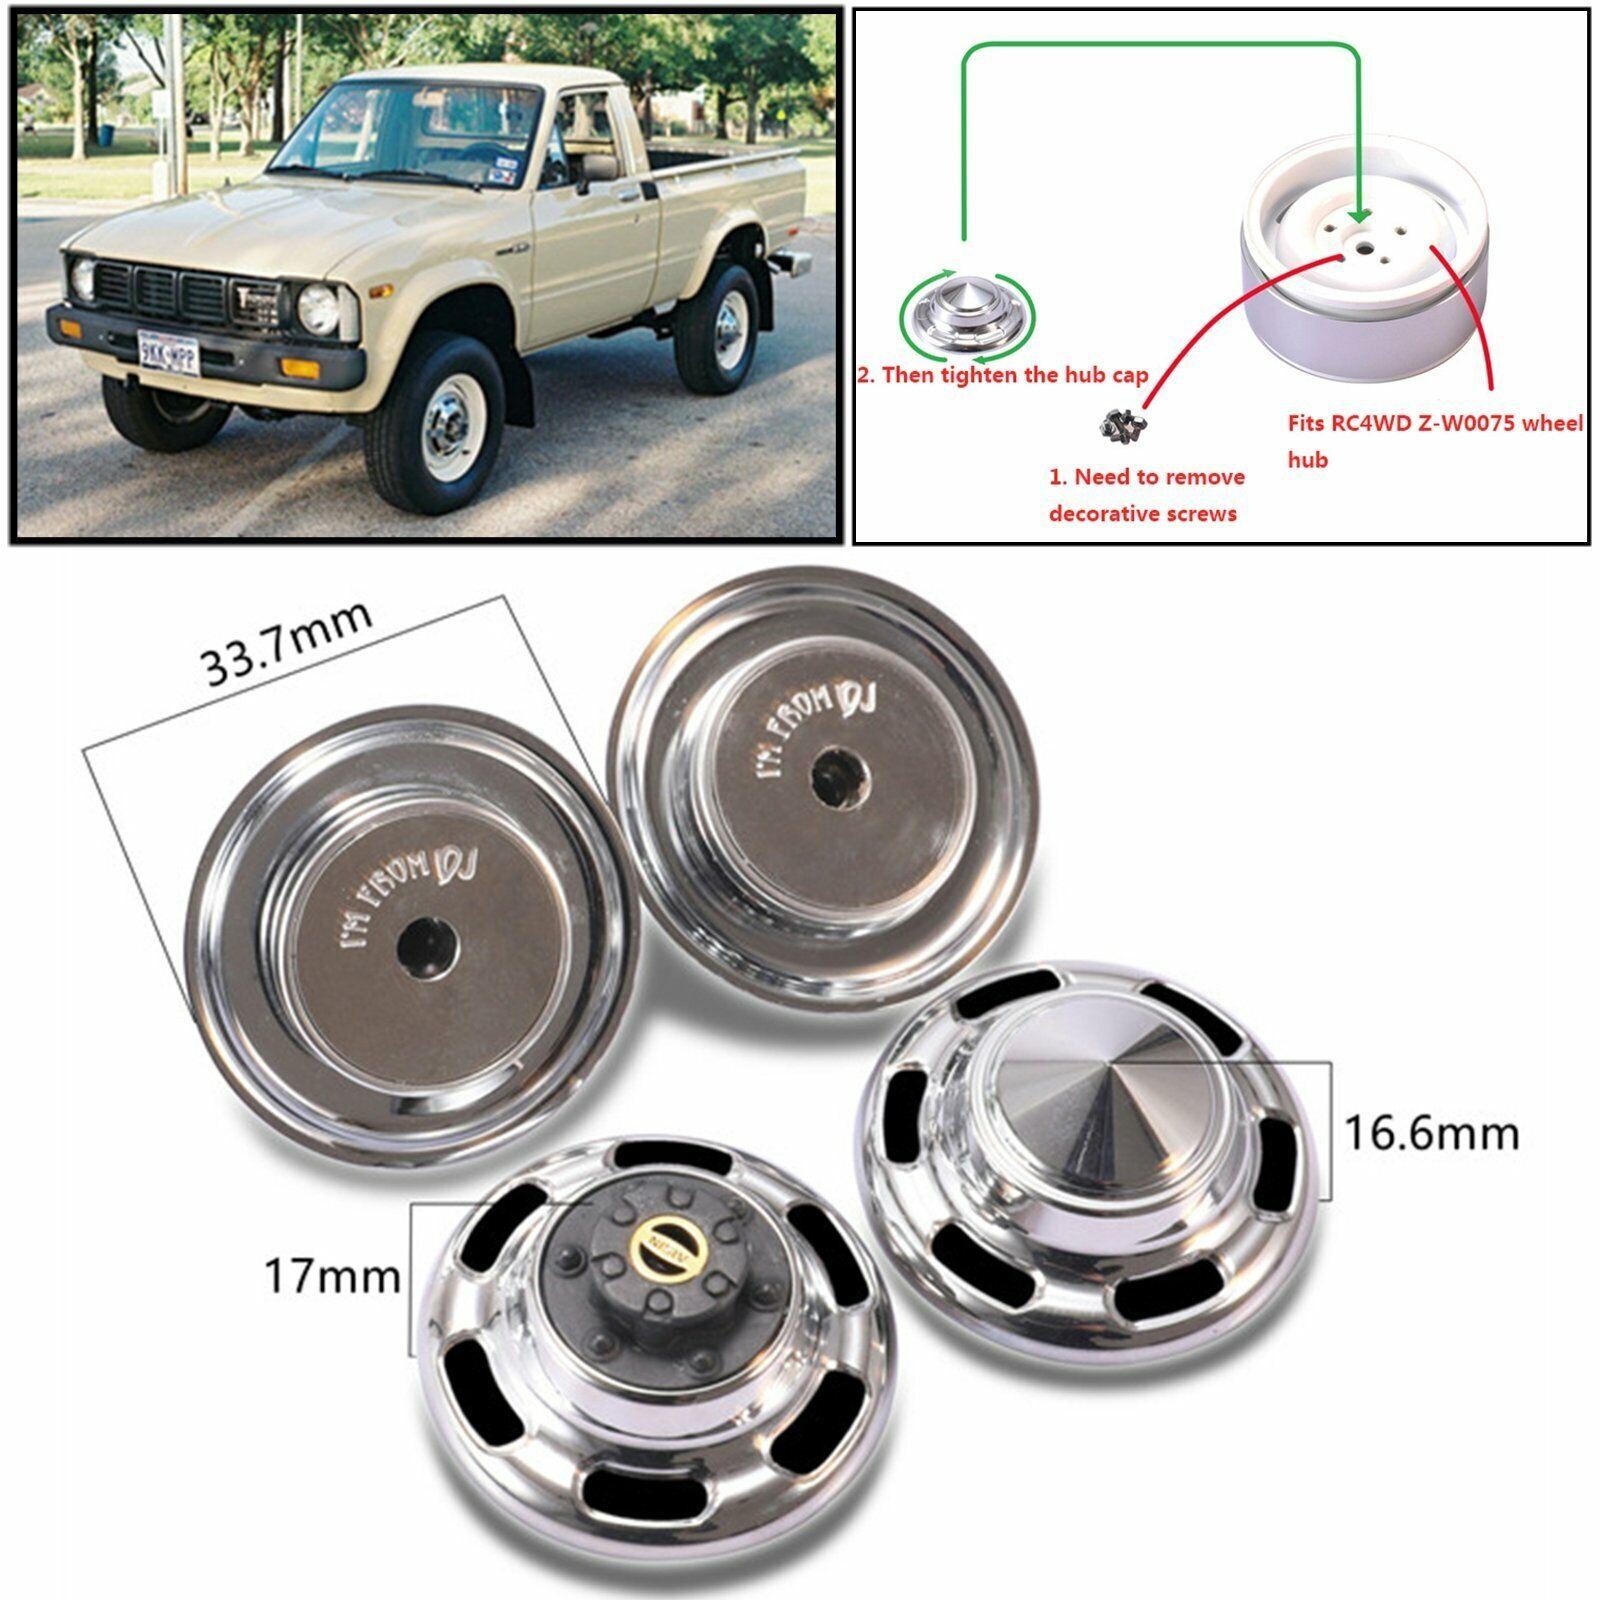 4x Metal Wheel Hub Cap Cover For TOYOTA TF2 FJ40 FJ45 FJ55 HPI lc70 4WD RC Car